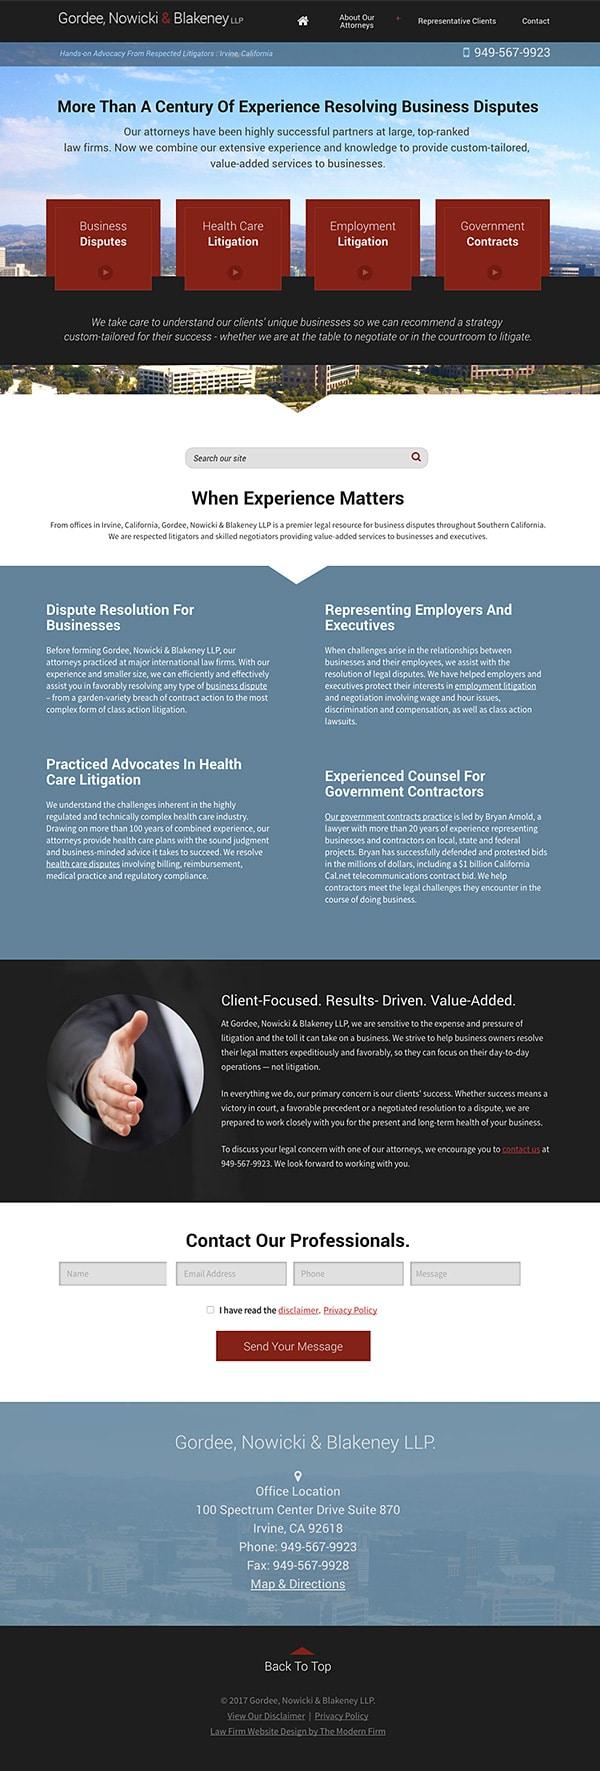 Law Firm Website Design for Gordee, Nowicki & Blakeney LLP